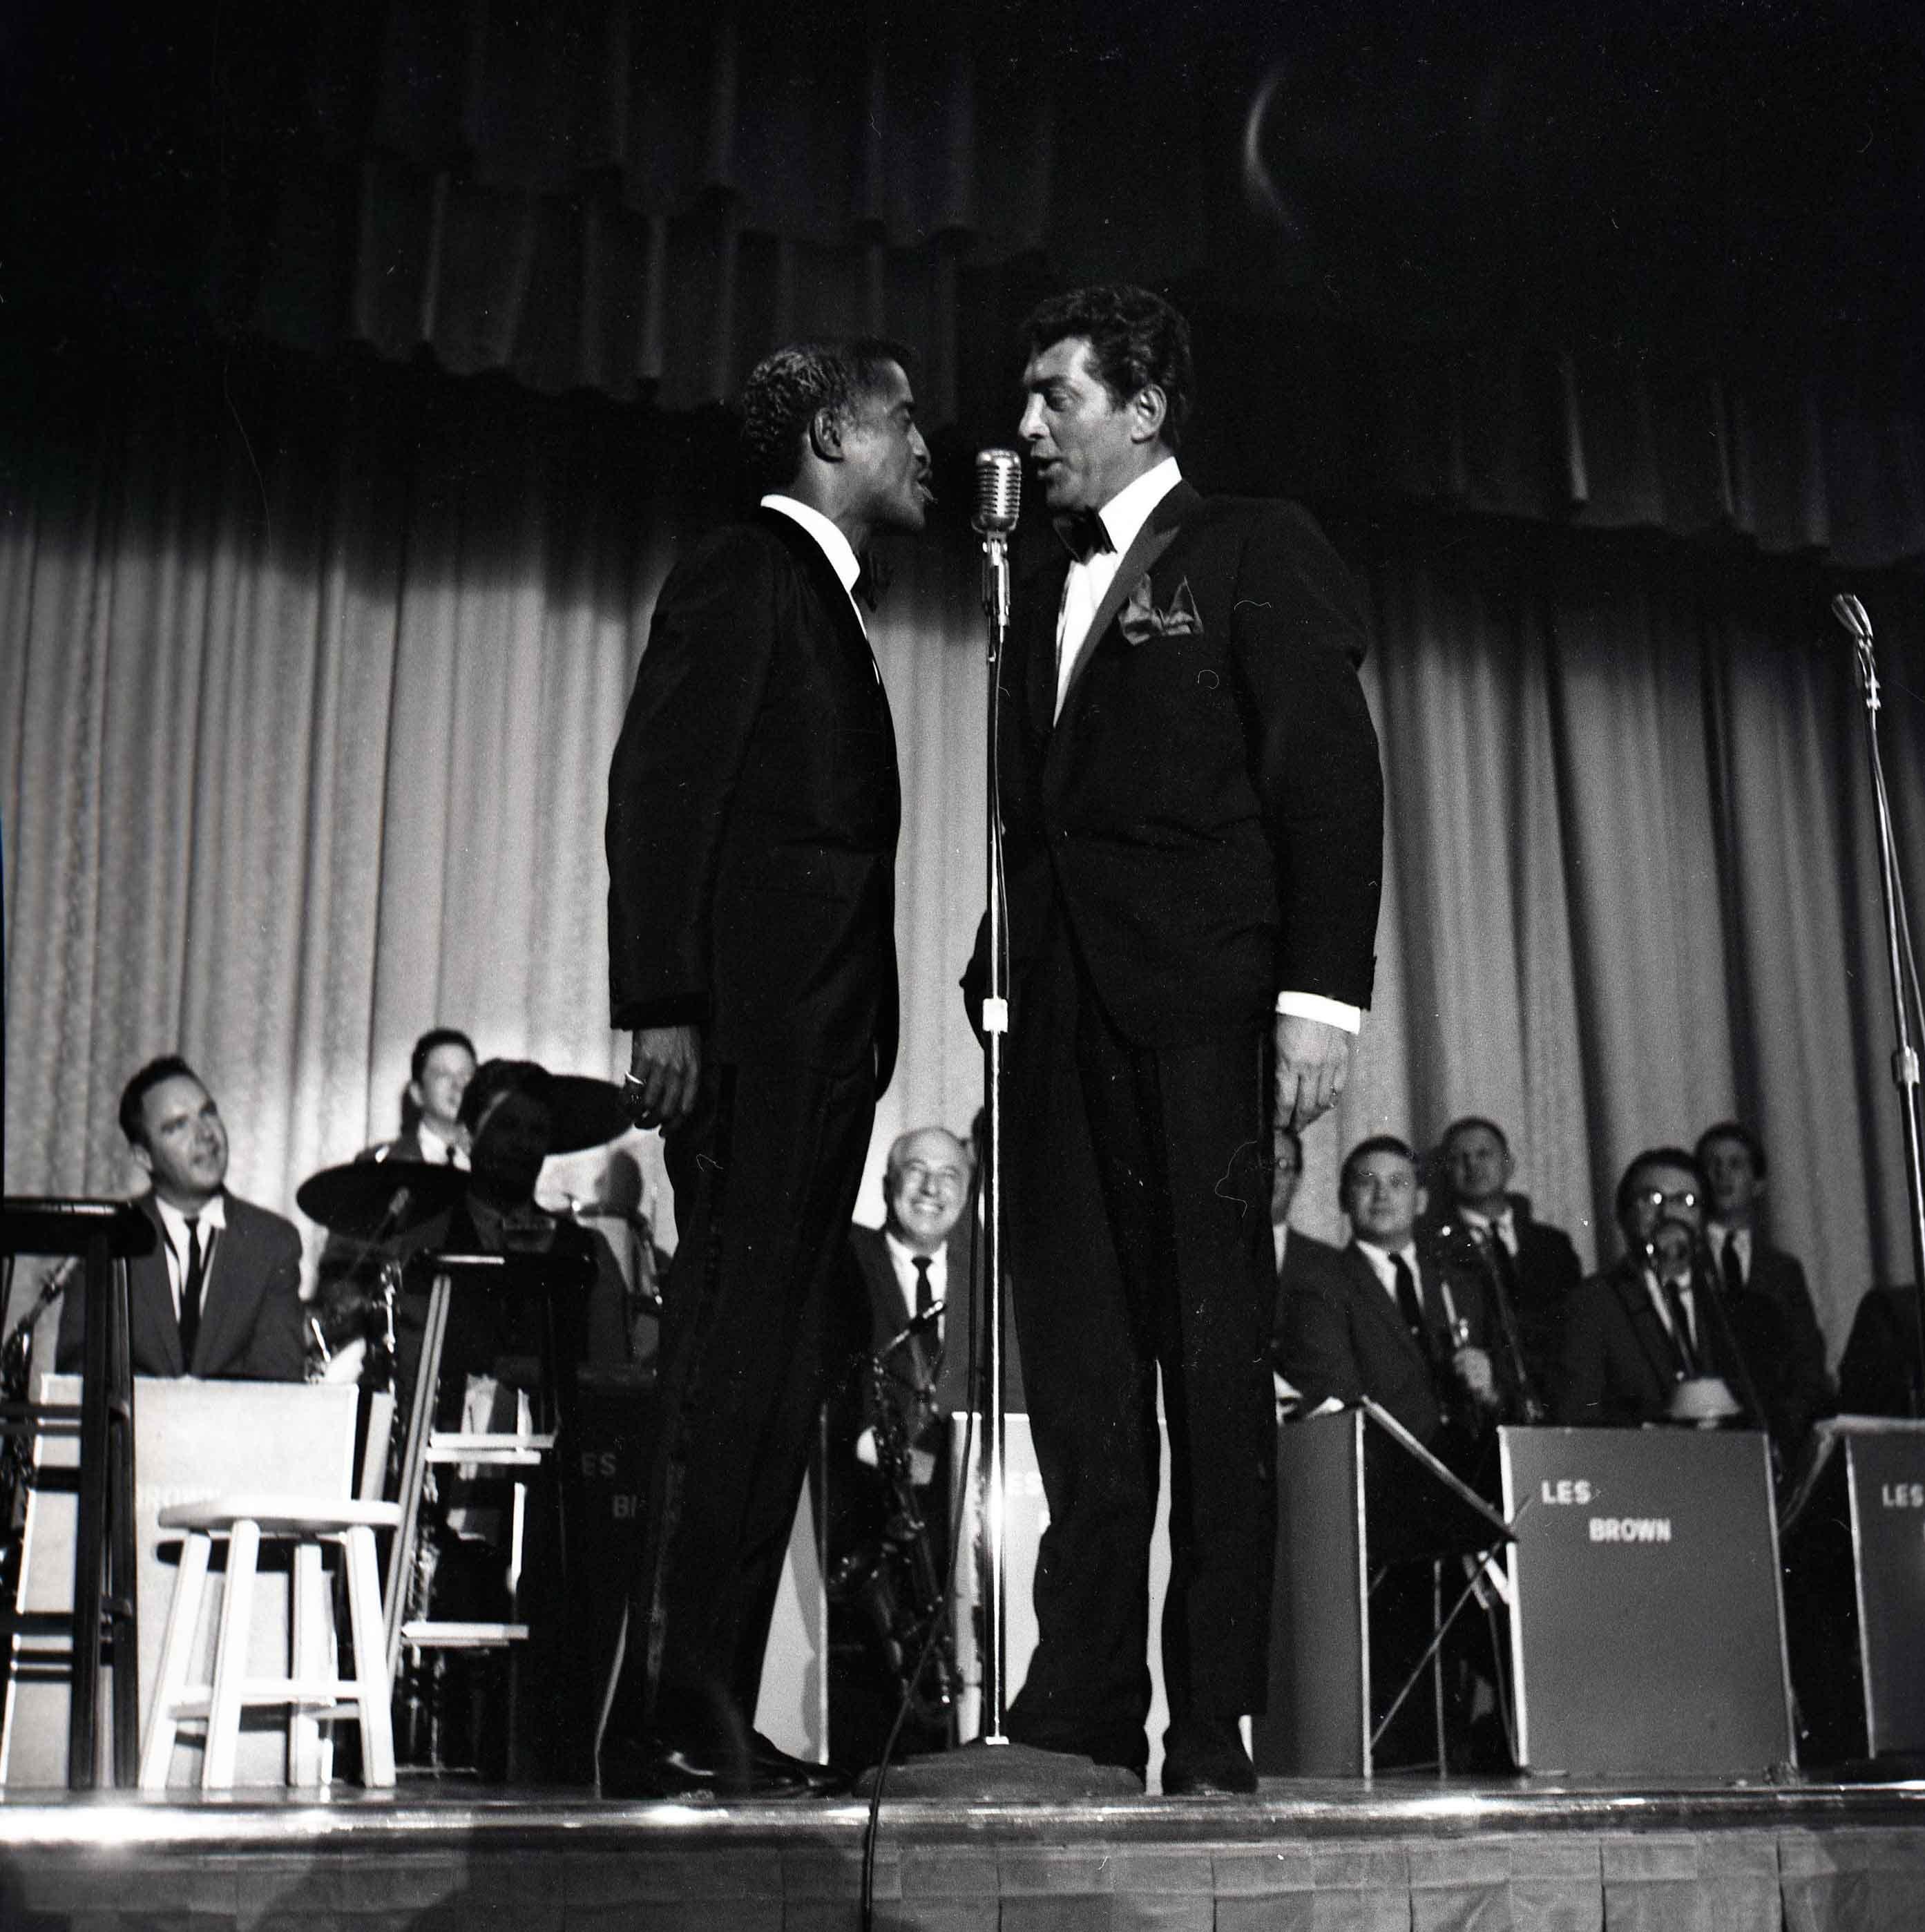 The spectacular generosity and philanthropy of Sammy Davis, Jr.